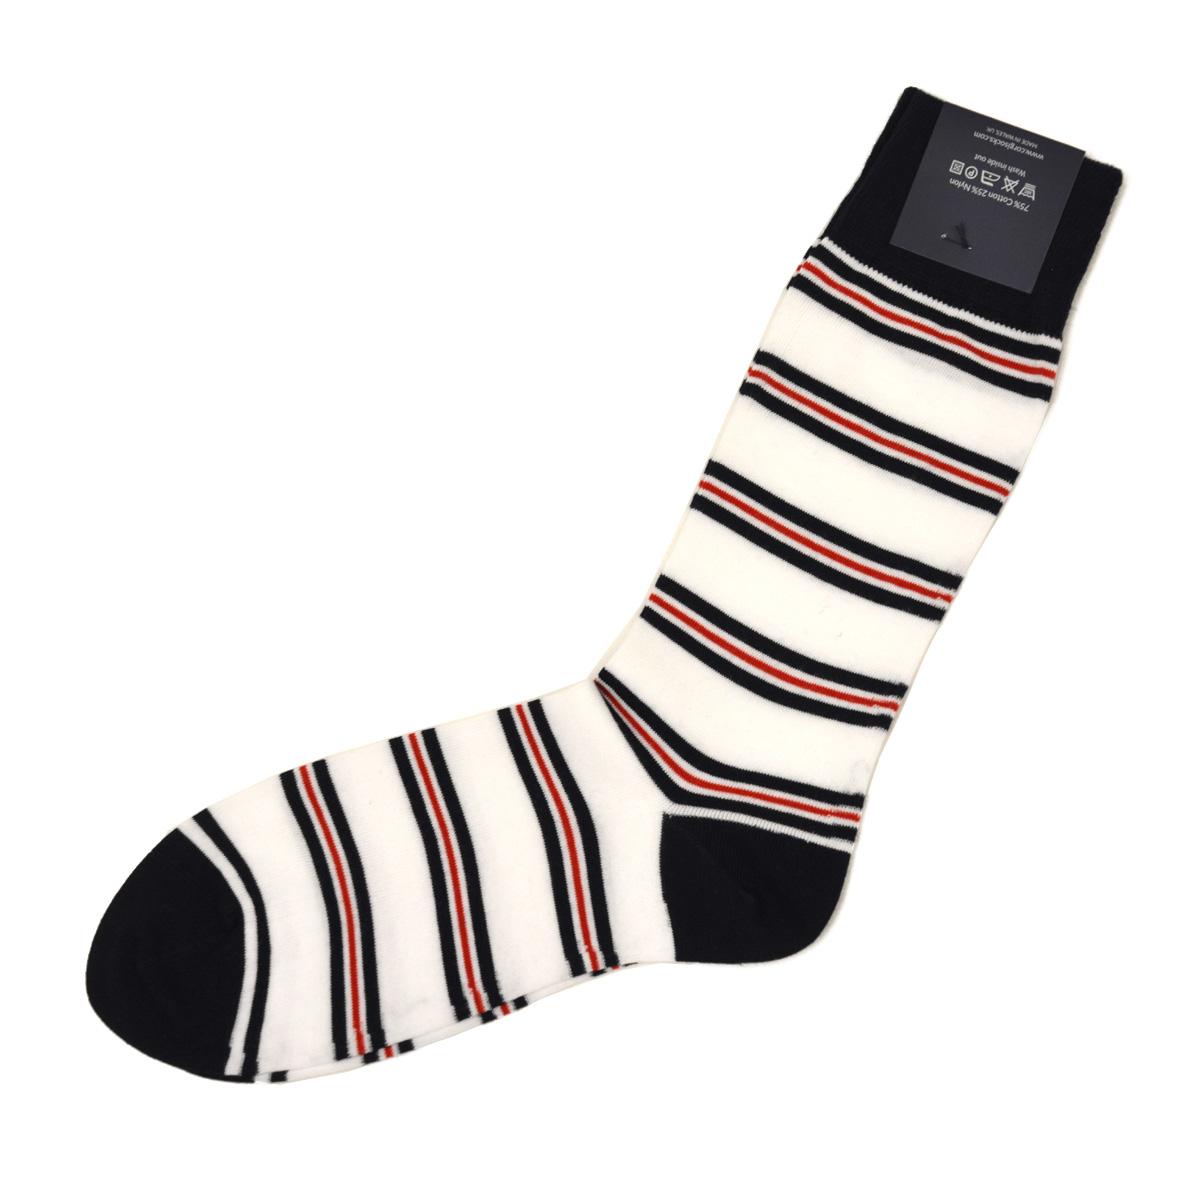 CORGI【コーギー】ソックス靴下 80 45 4102 Royal Gurkha Stripe Sock コットン ナイロン 薄手 ホワイト